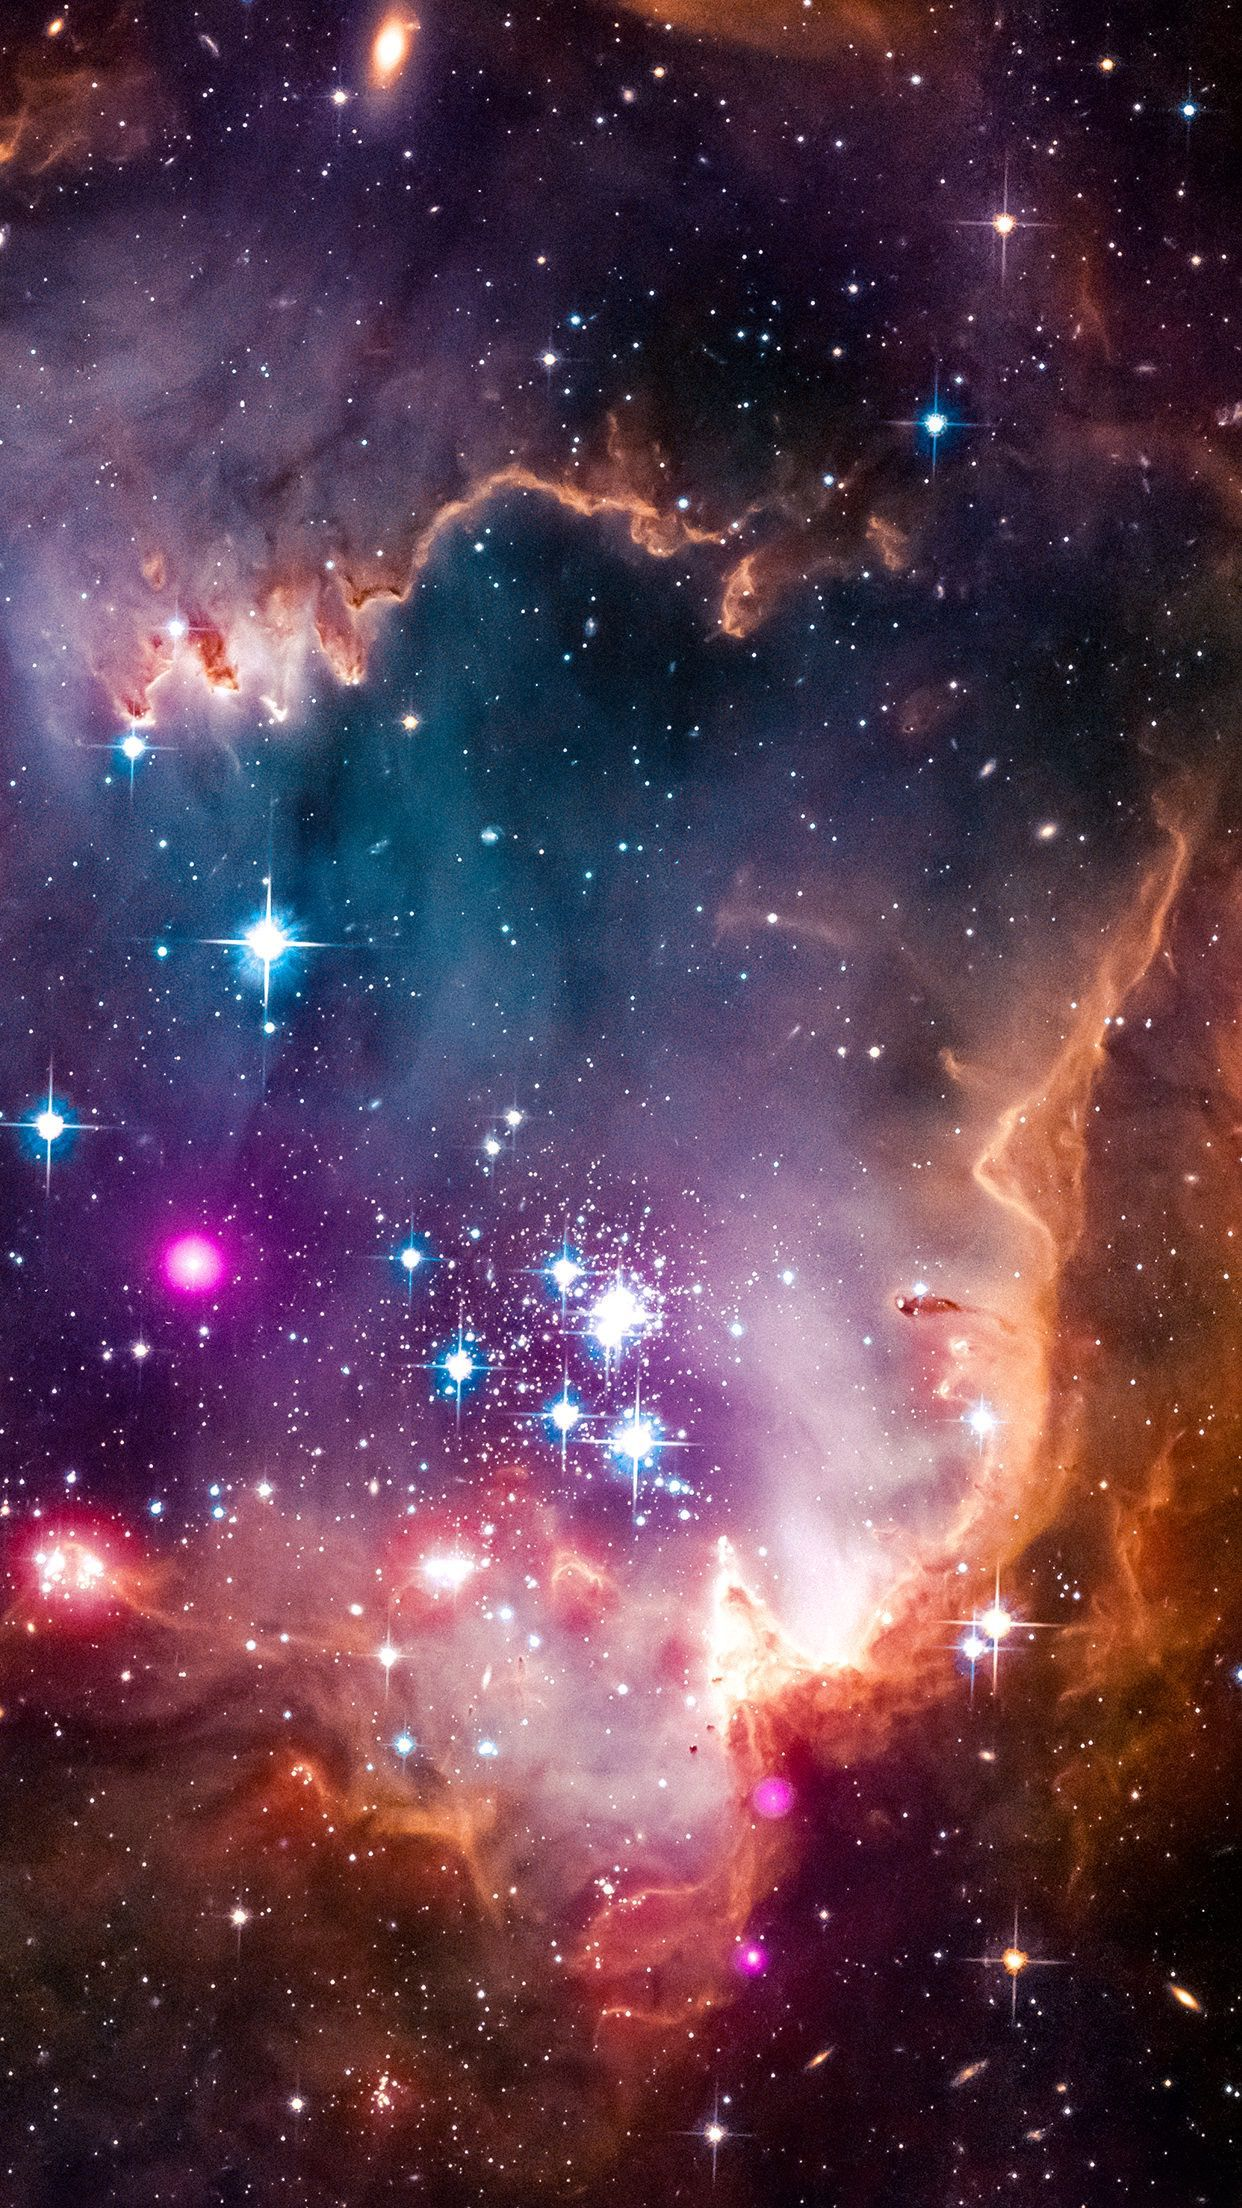 Ultra Hd Space Wallpaper Iphone